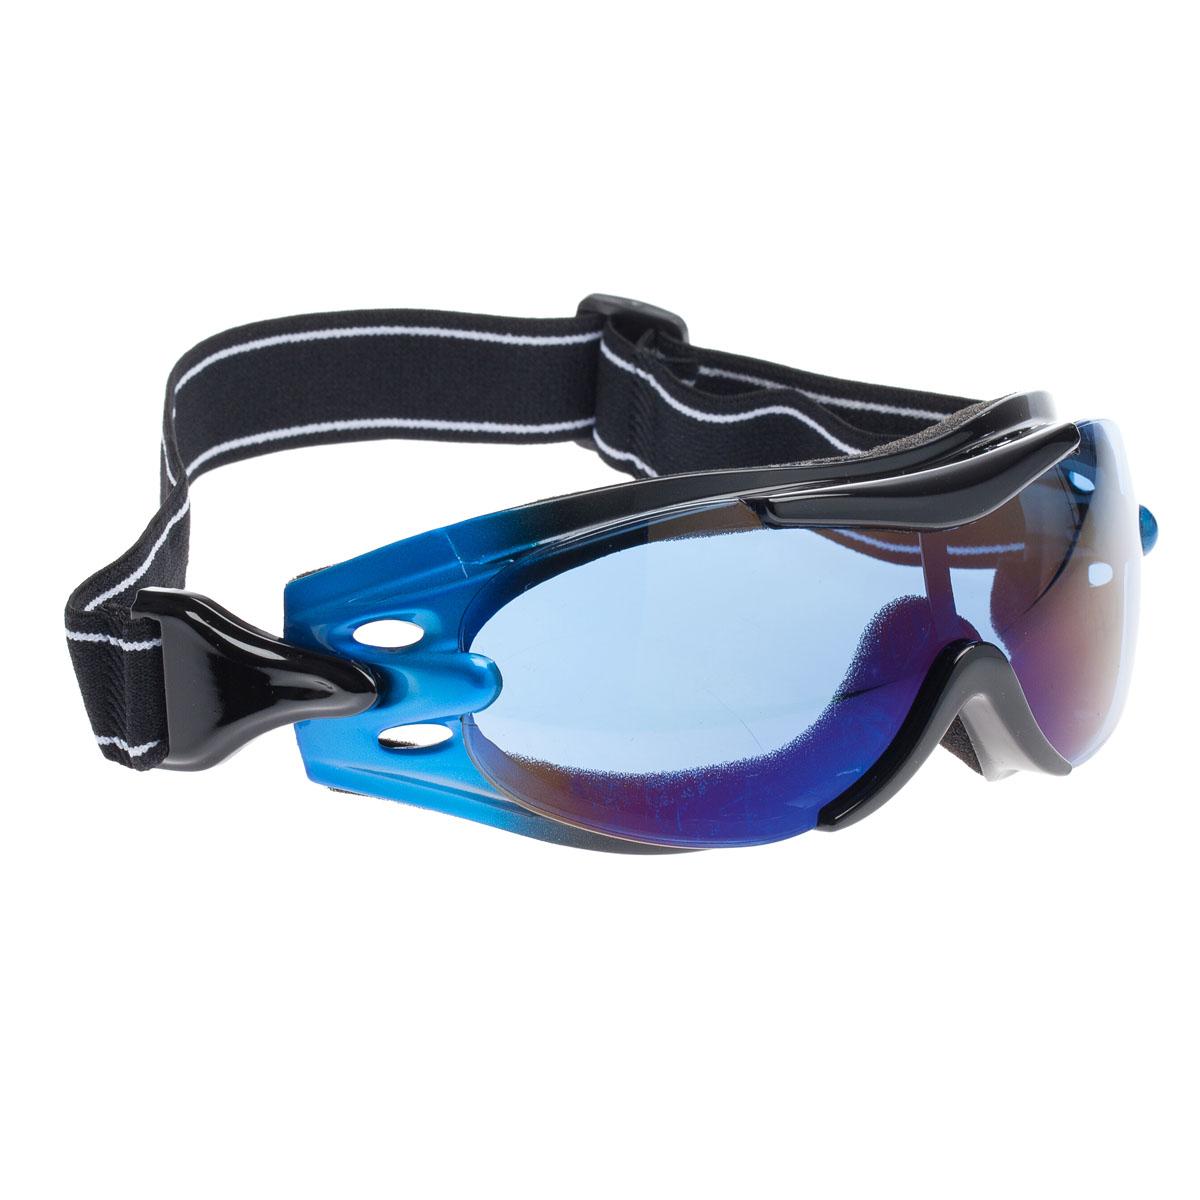 очки горнолыжные vcan ag0172 vse64 Горнолыжные очки Exparc, 15653-8